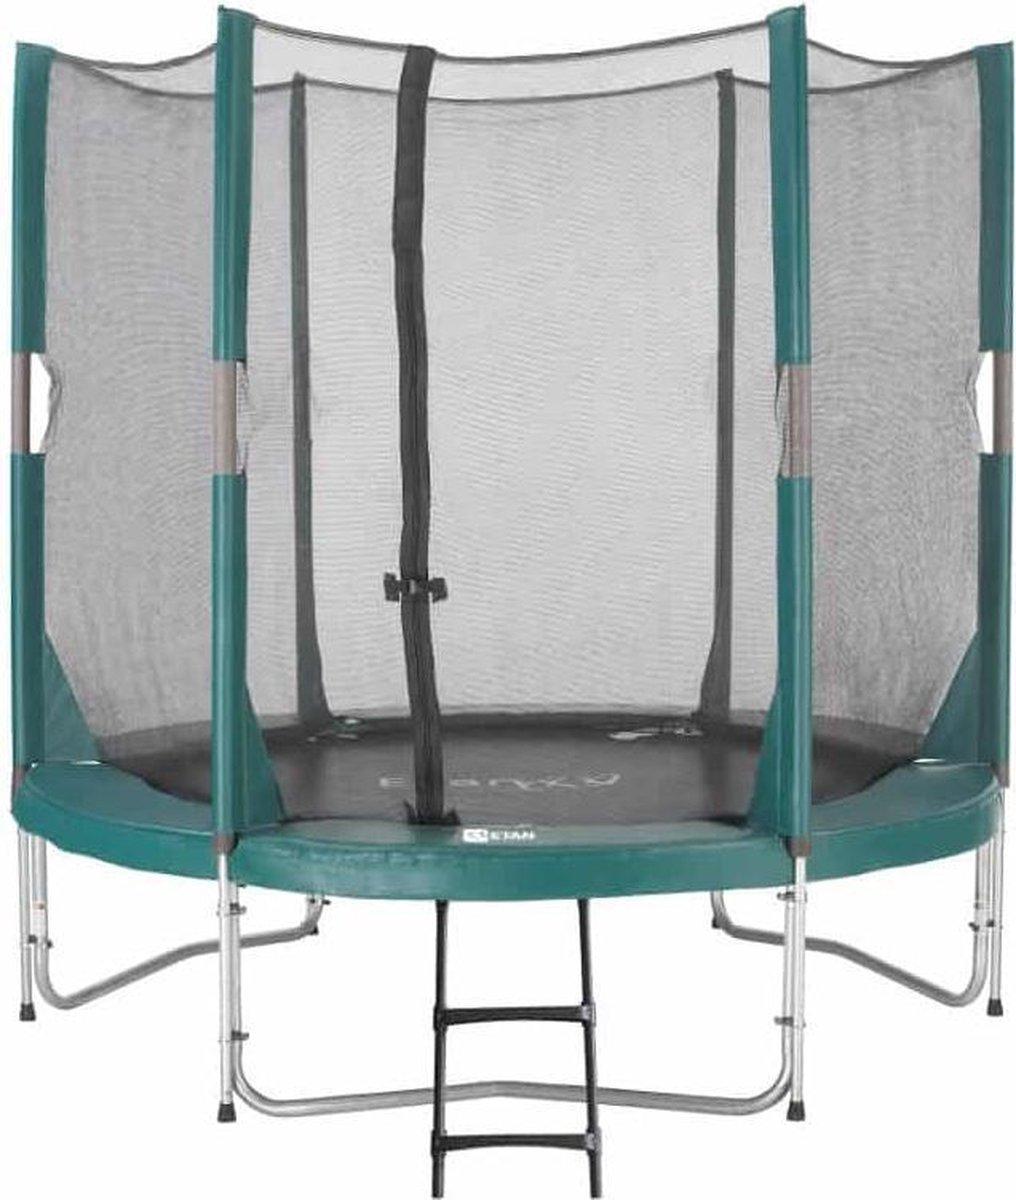 Etan Hi-Flyer Trampoline - 250 cm - Inclusief Veiligheidsnet